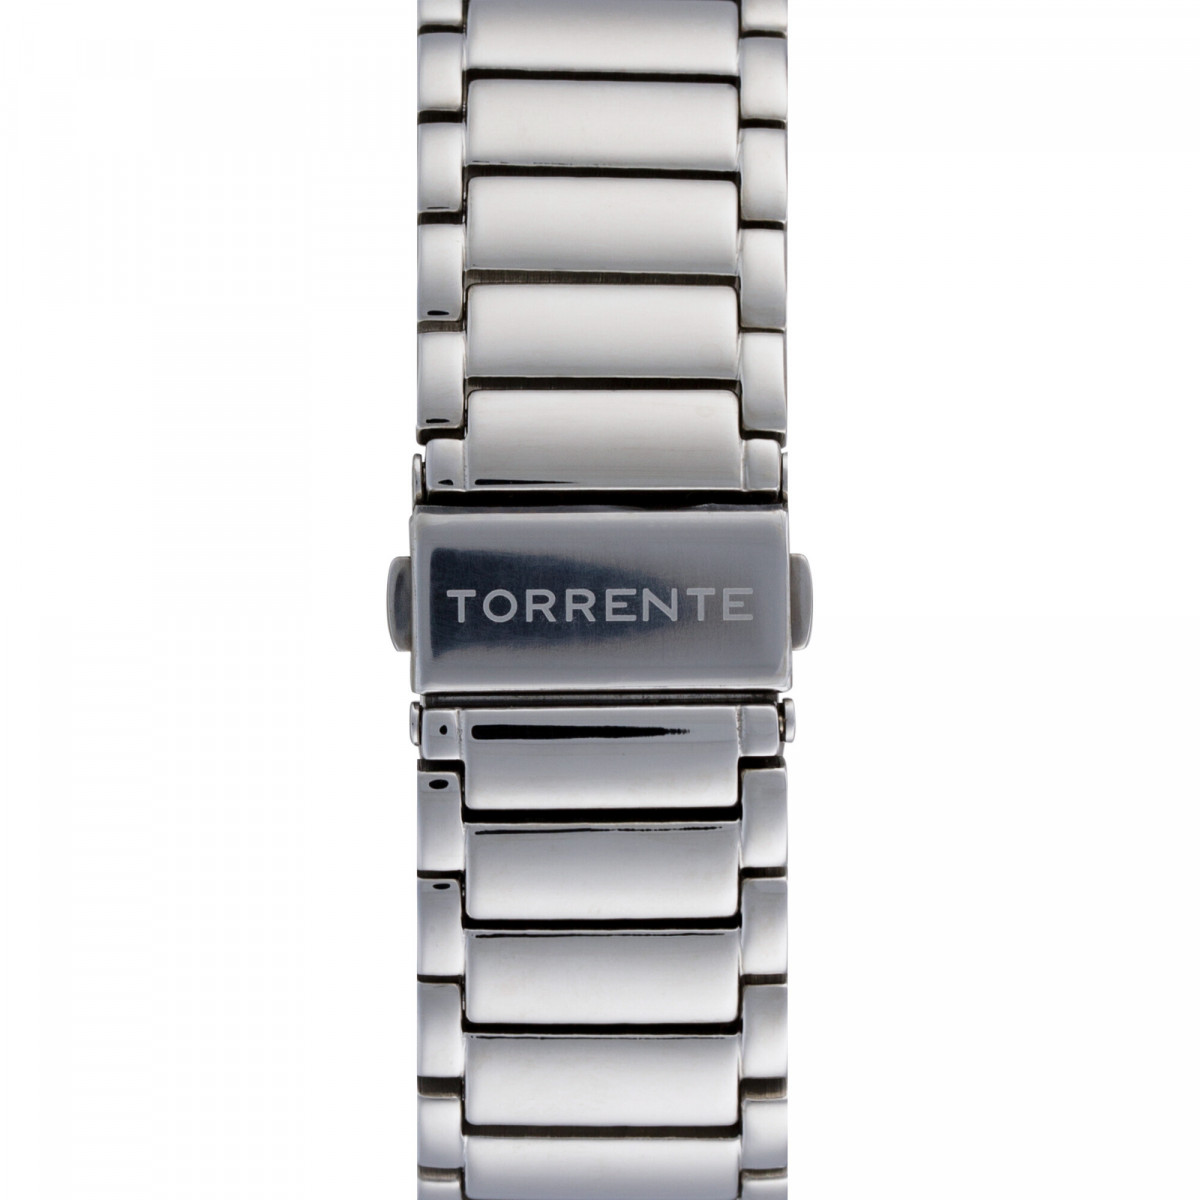 "Torrente - Montre Homme ""MOMENTO"" Bracelet Acier - TF140C3BM1"